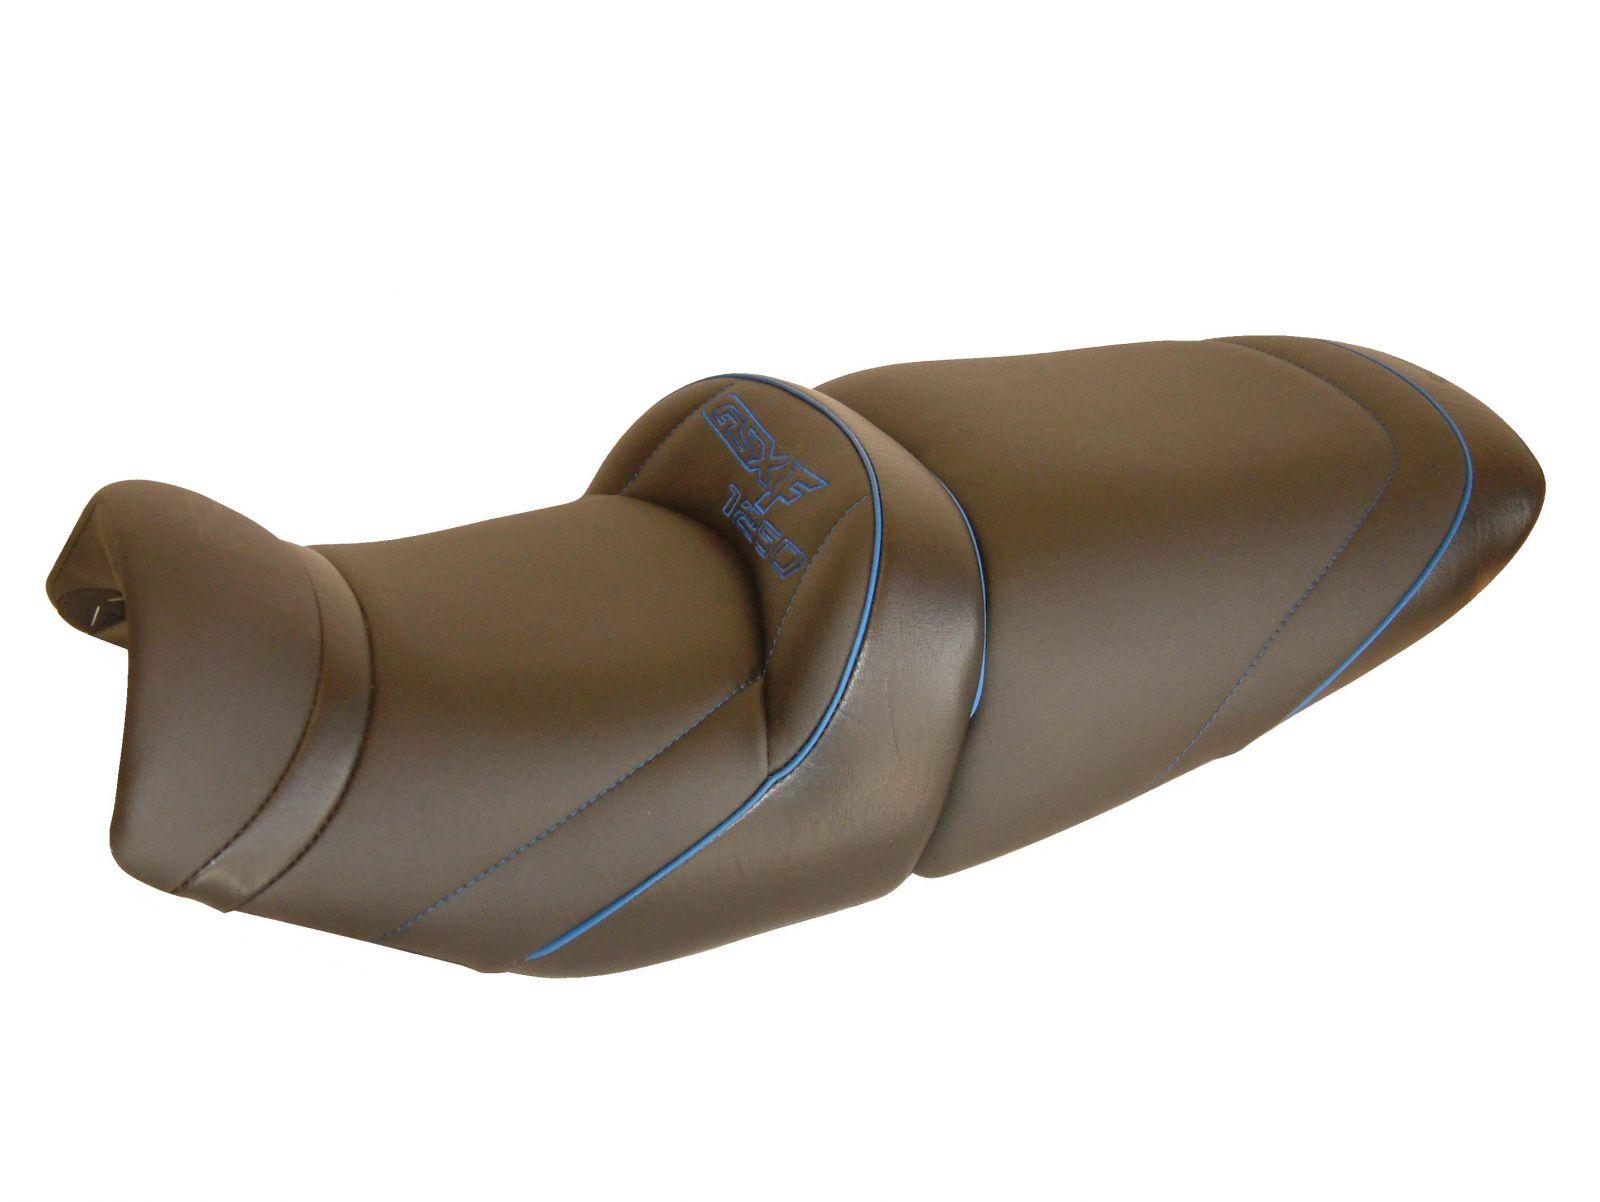 Deluxe zadel SGC3230 - SUZUKI GSX-F 1250 réglable en hauteur [≥ 2010]